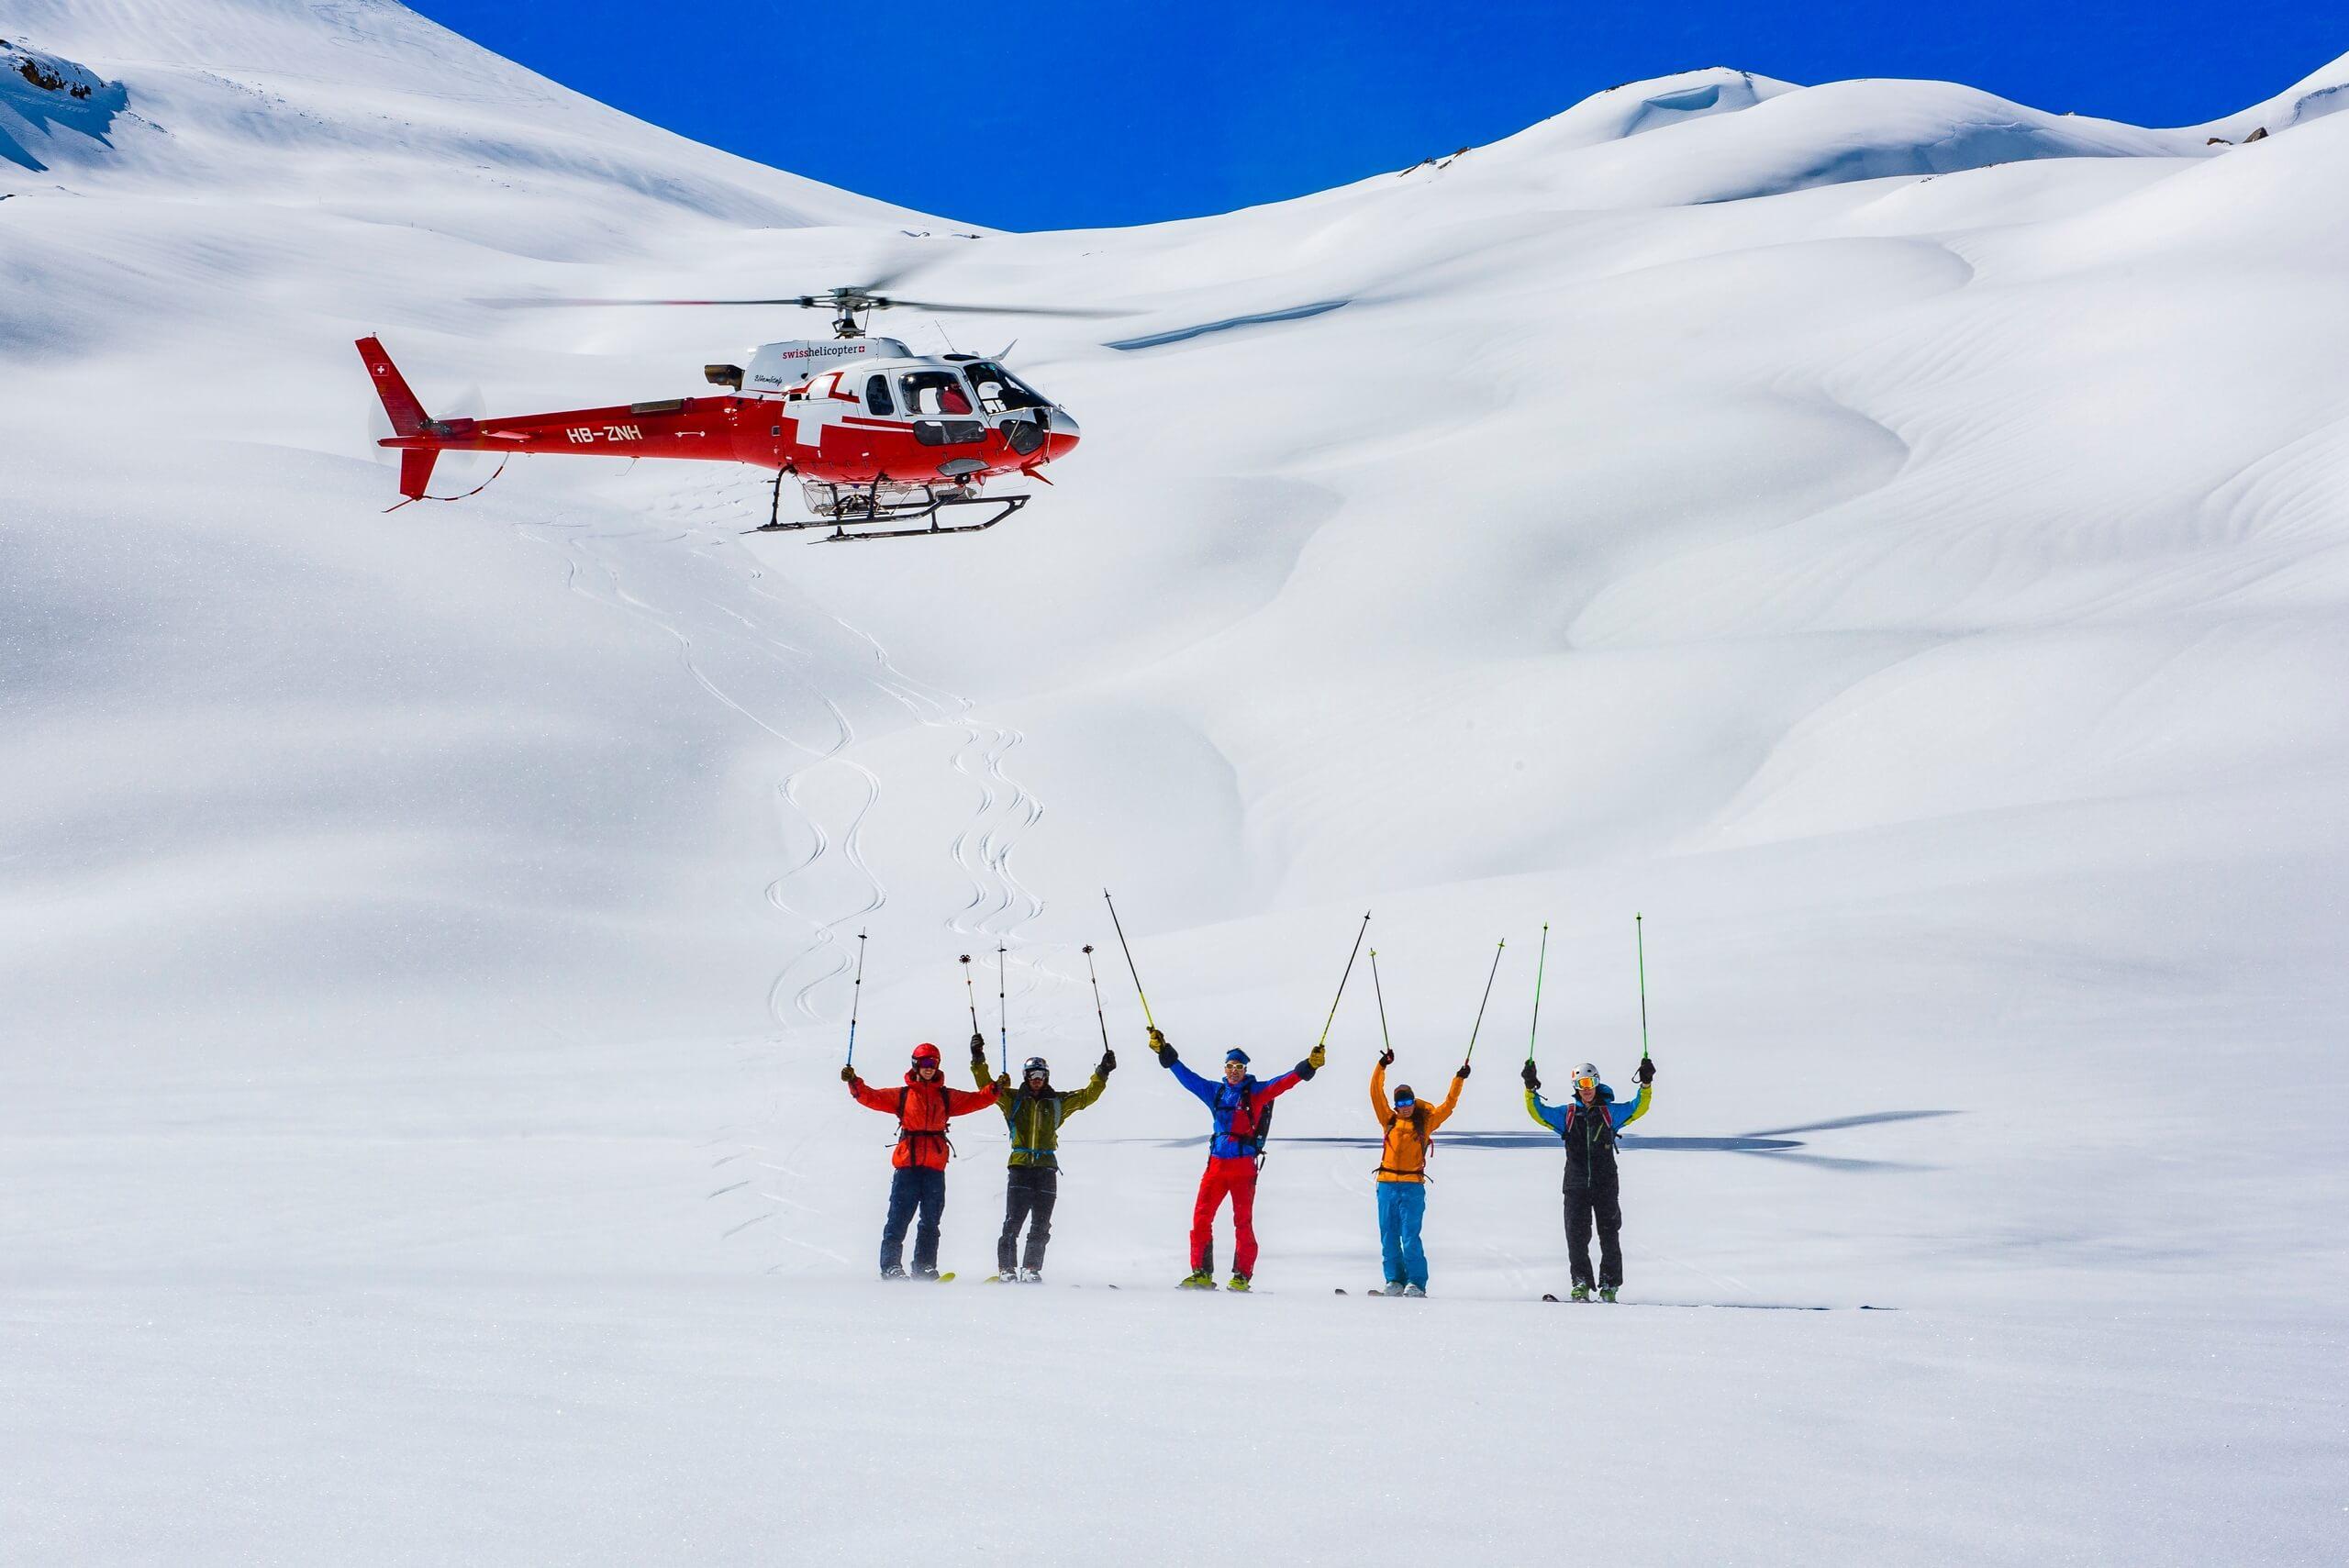 swiss-helicopter-ski-tour-rundflug-winter-panorama